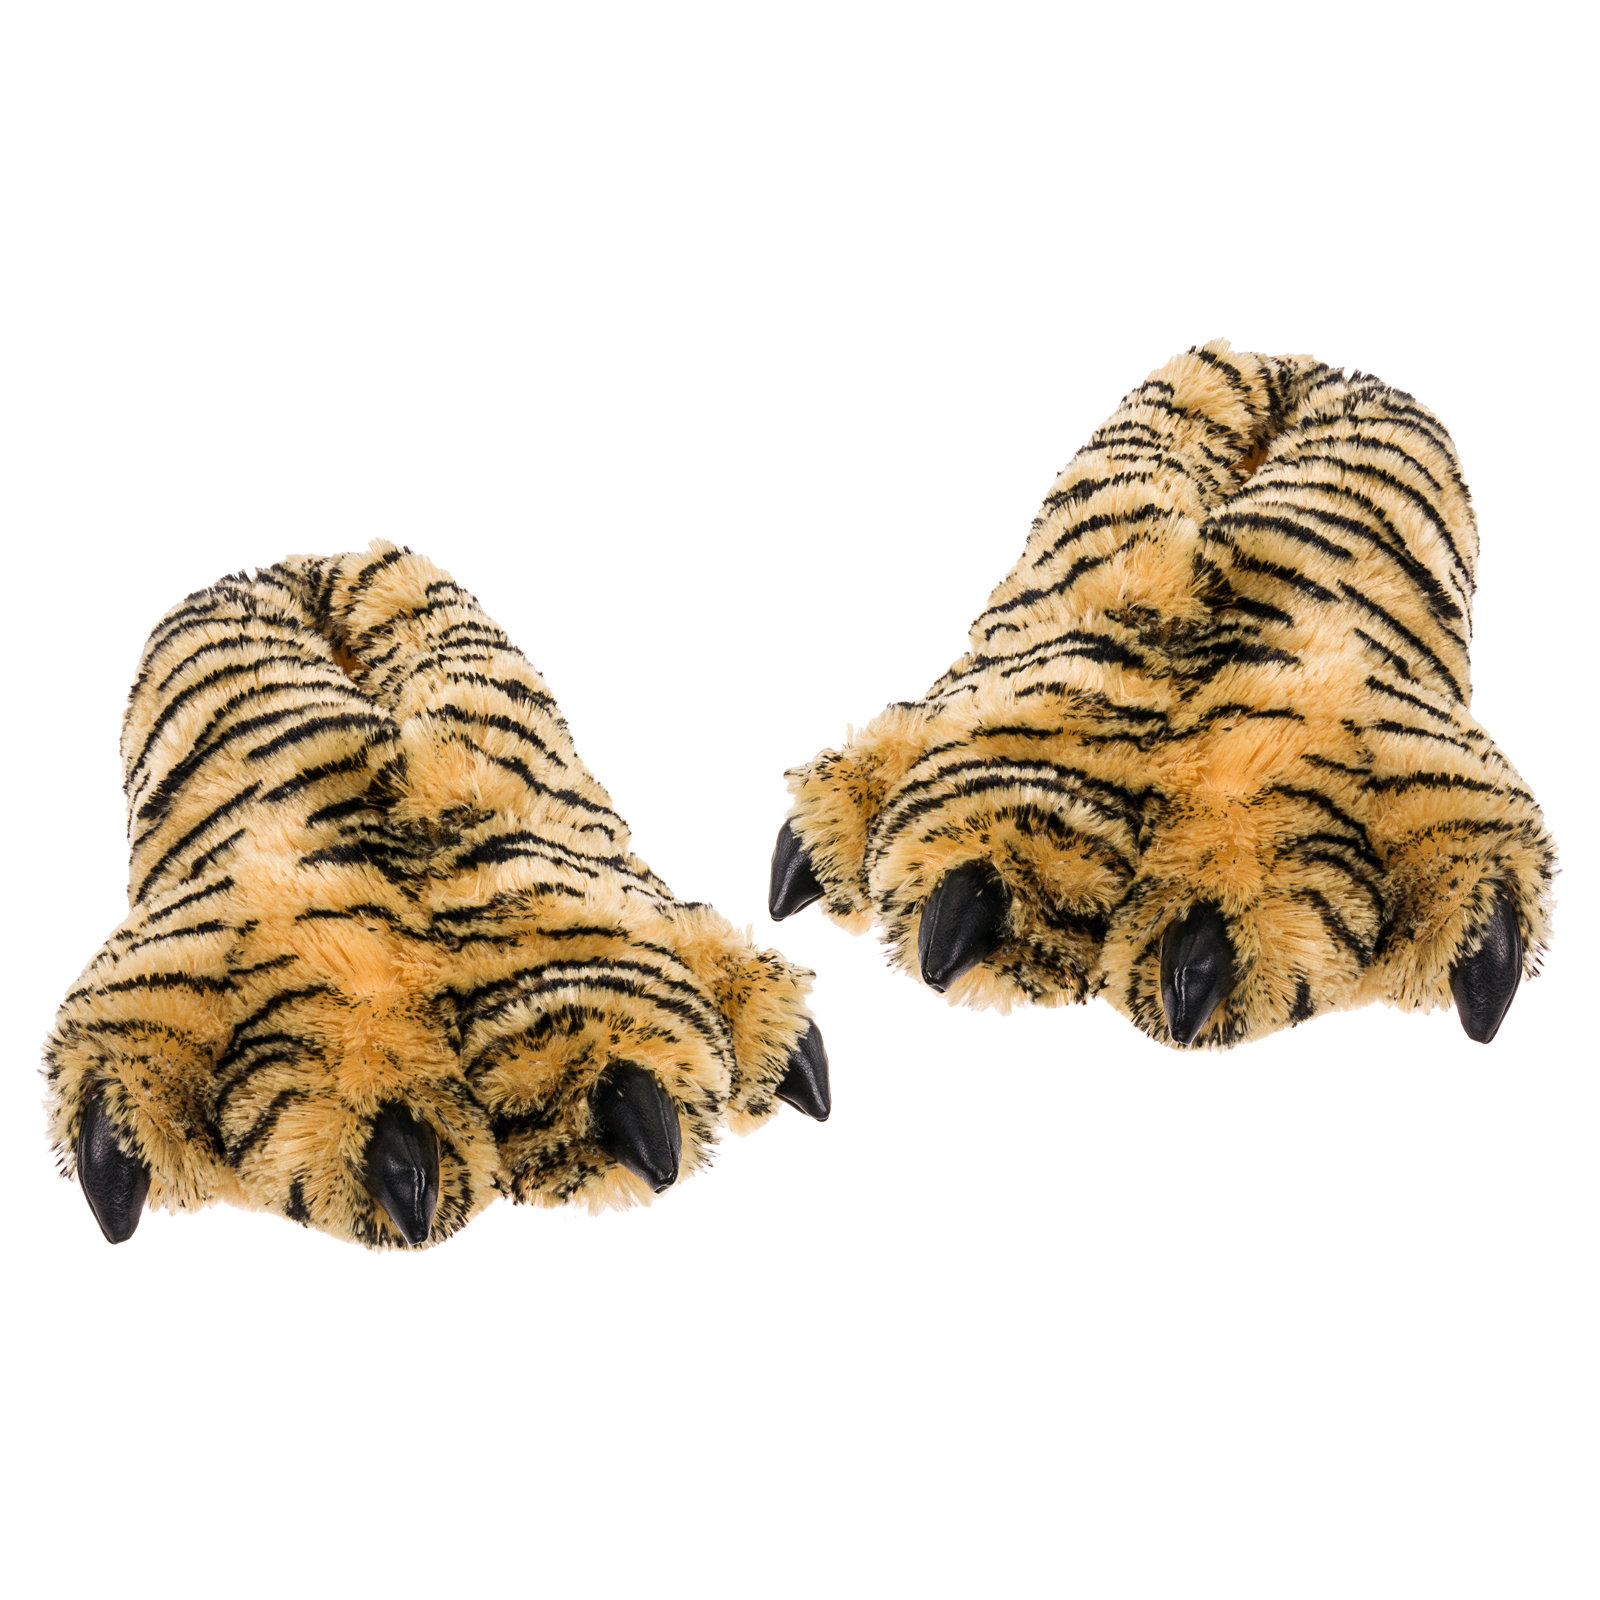 Wishpets Medium Size Unisex 5-9.5 Brown Tiger Animal Paw Plush Fuzzy Slippers